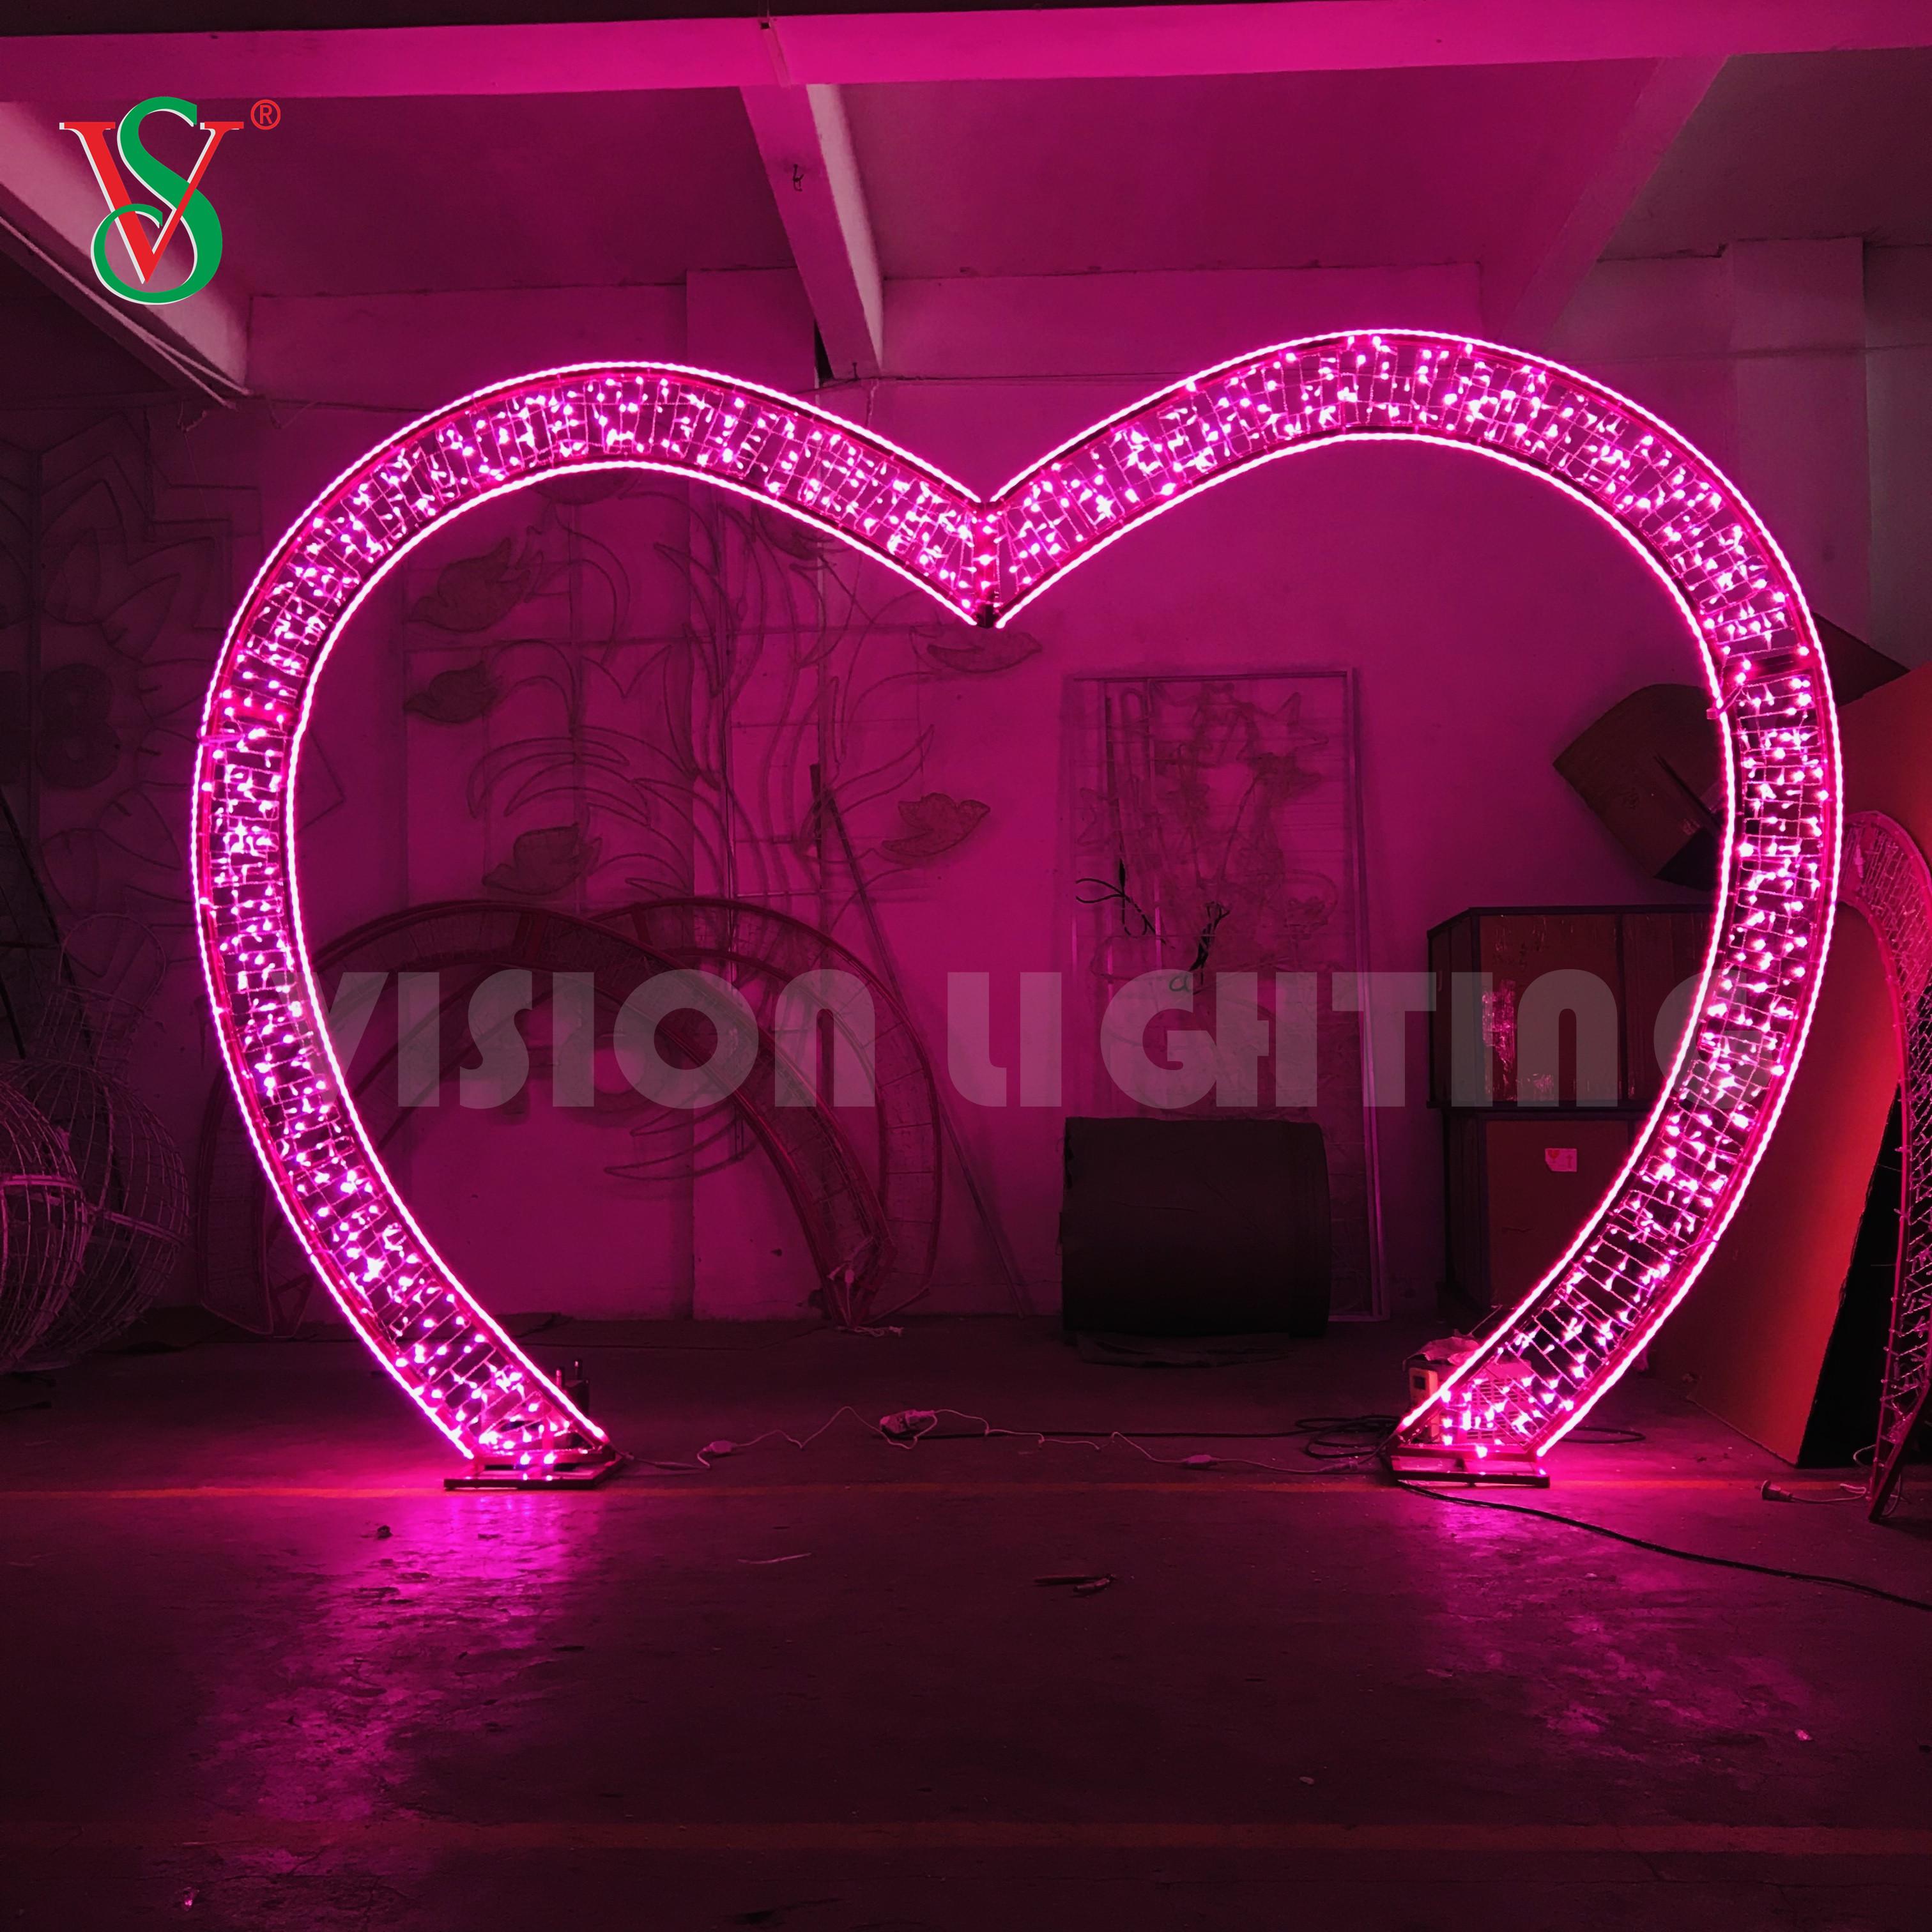 2D Steel Frame Passenger Aisle Romantic Heart Shape Motif Lighting Decoration for Valentine's Day & Wedding supplies